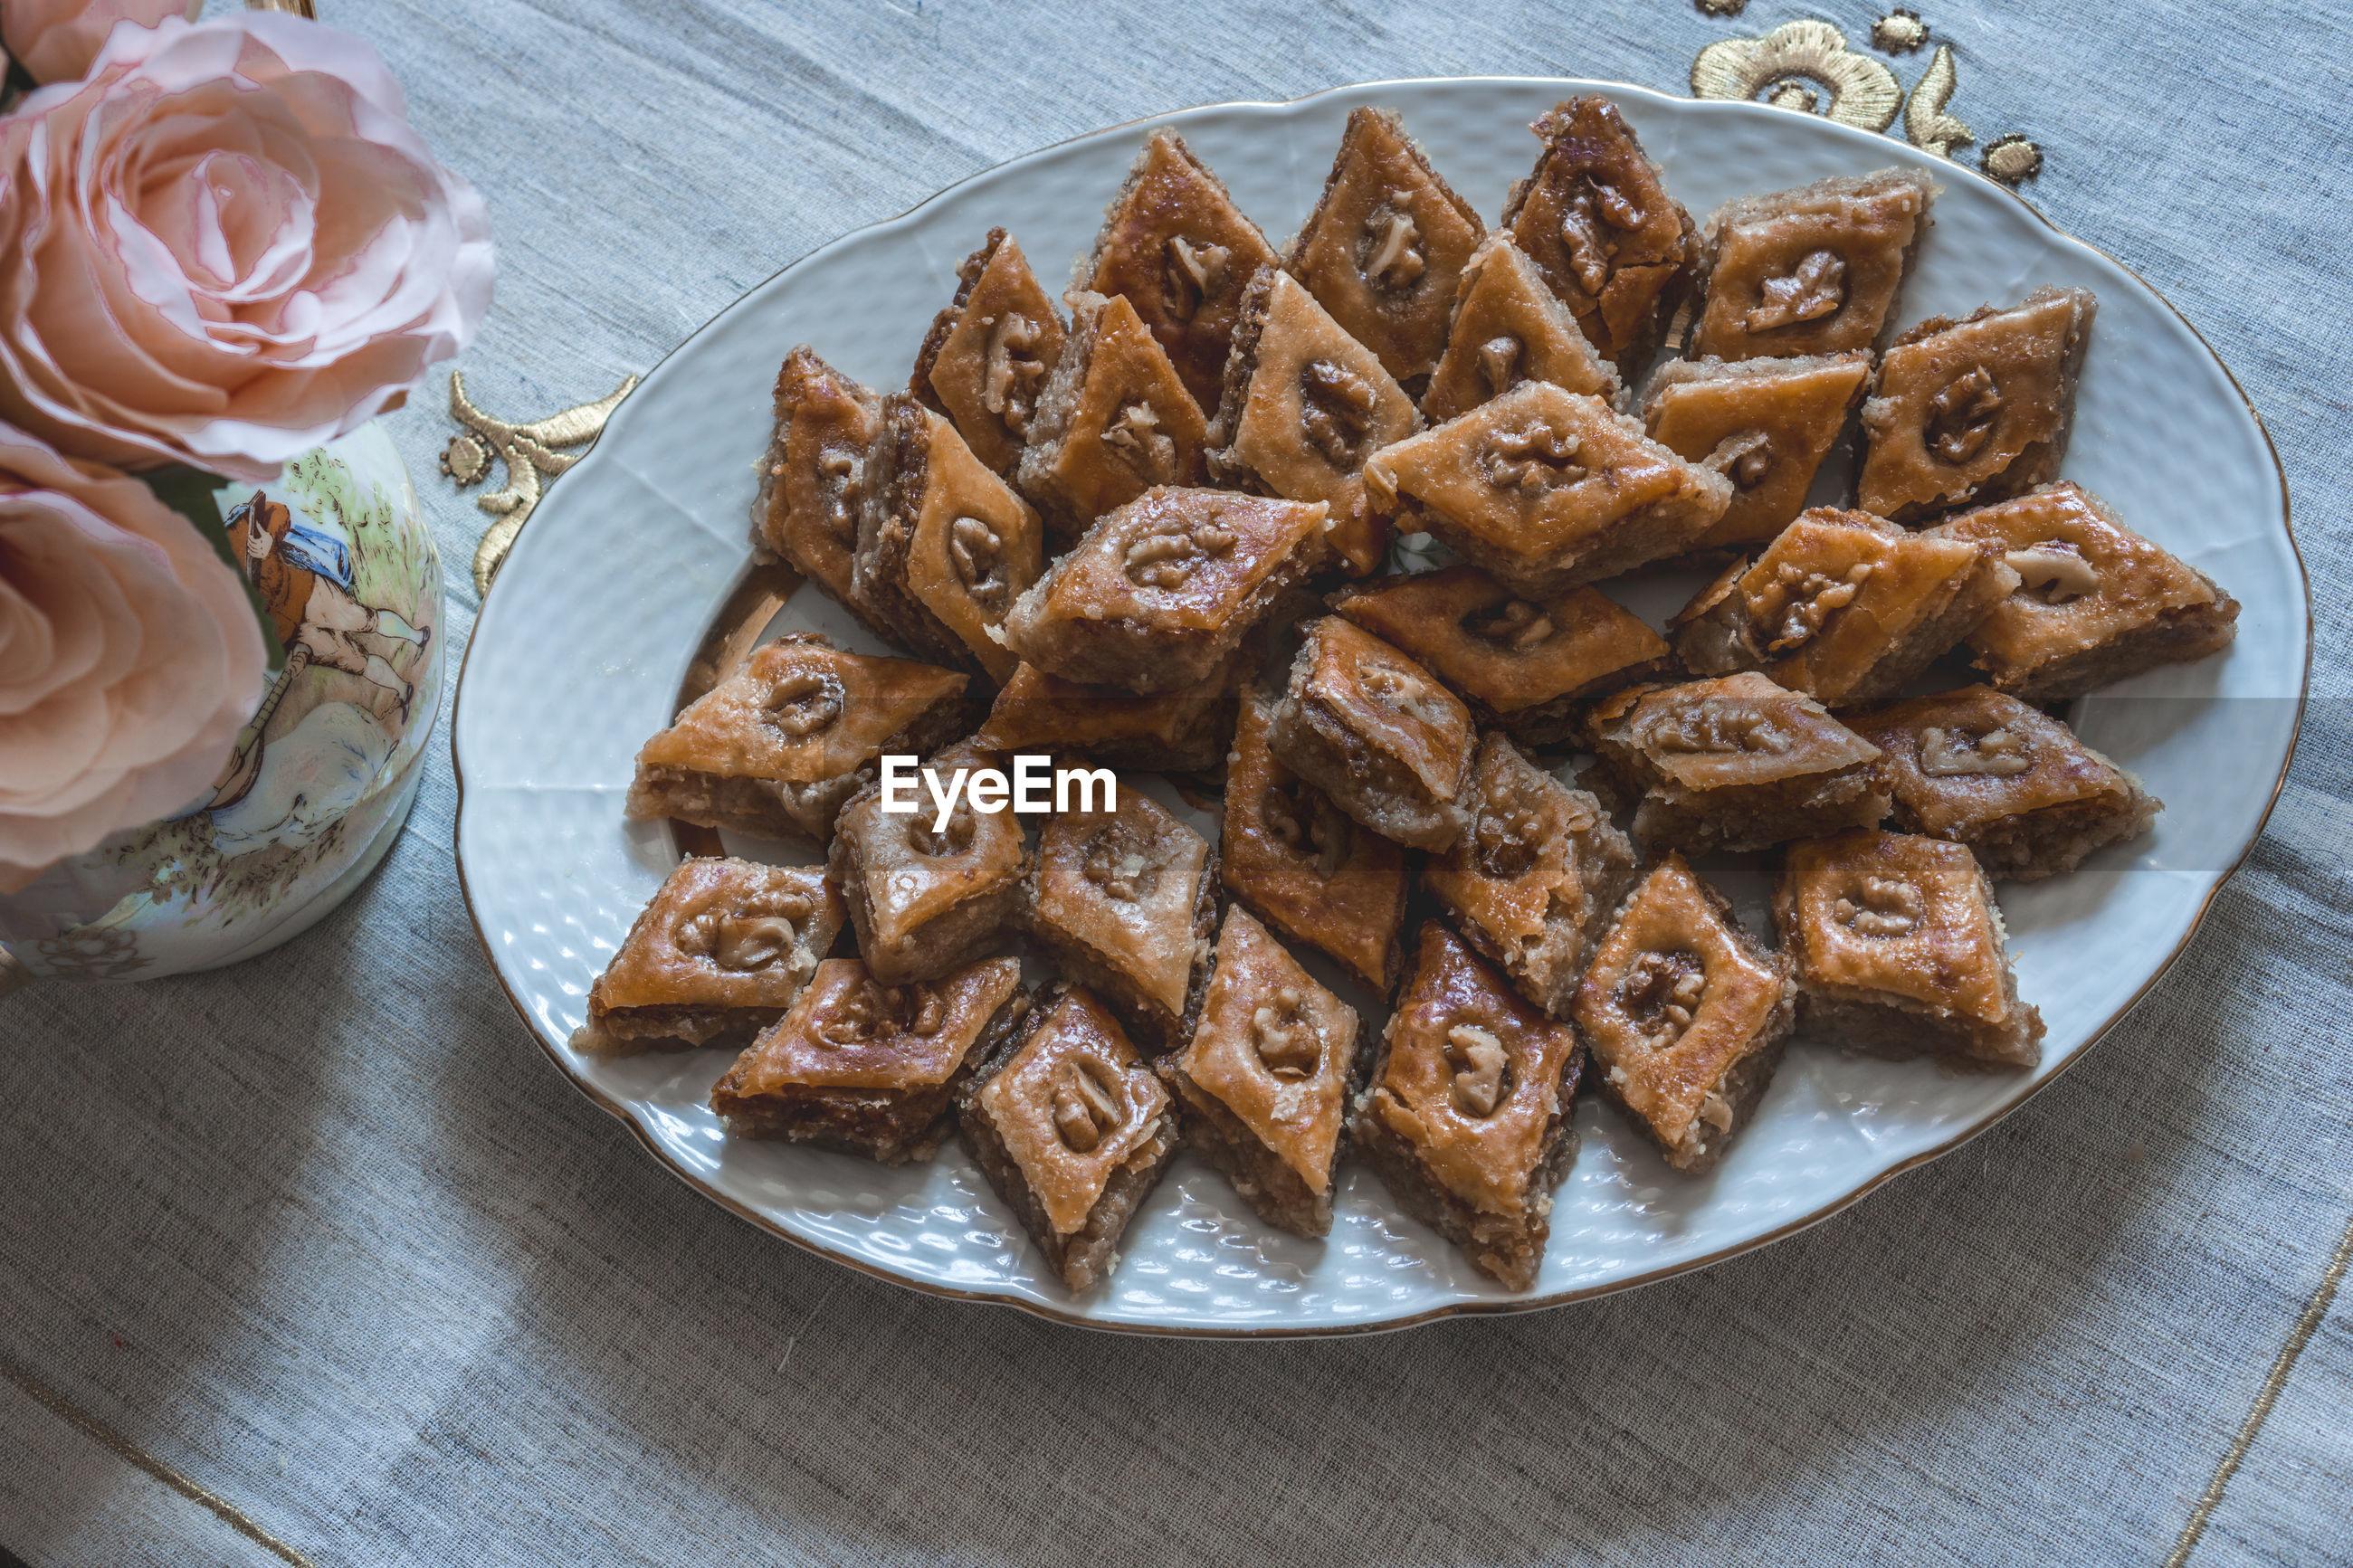 Traditional azerbaijan holiday nowruz cookies baklava on white plate.